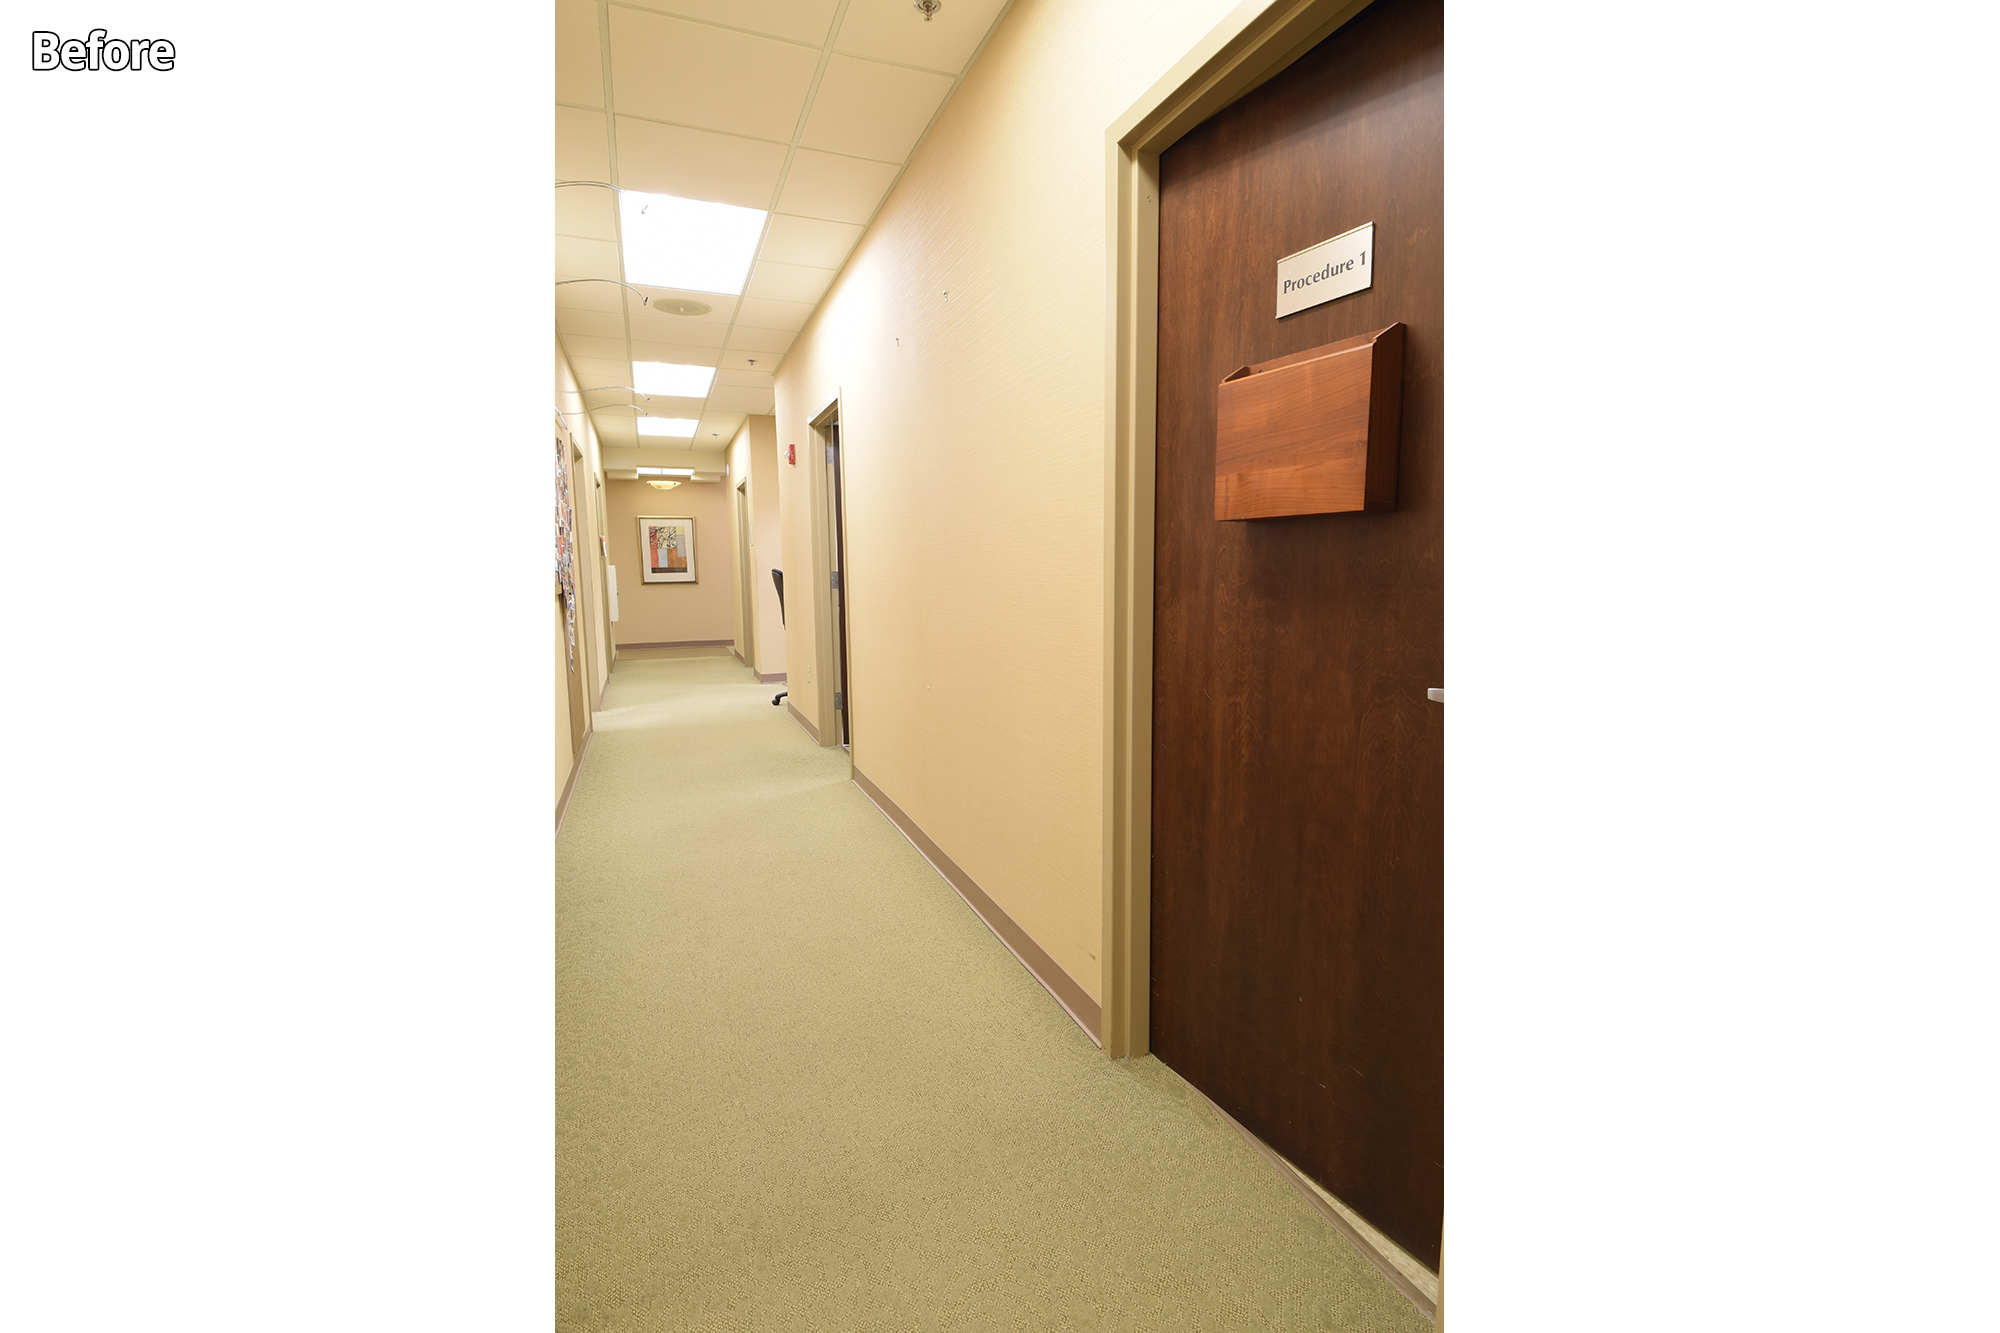 Atlanta Women's Obstetrics & Gynecology Photo